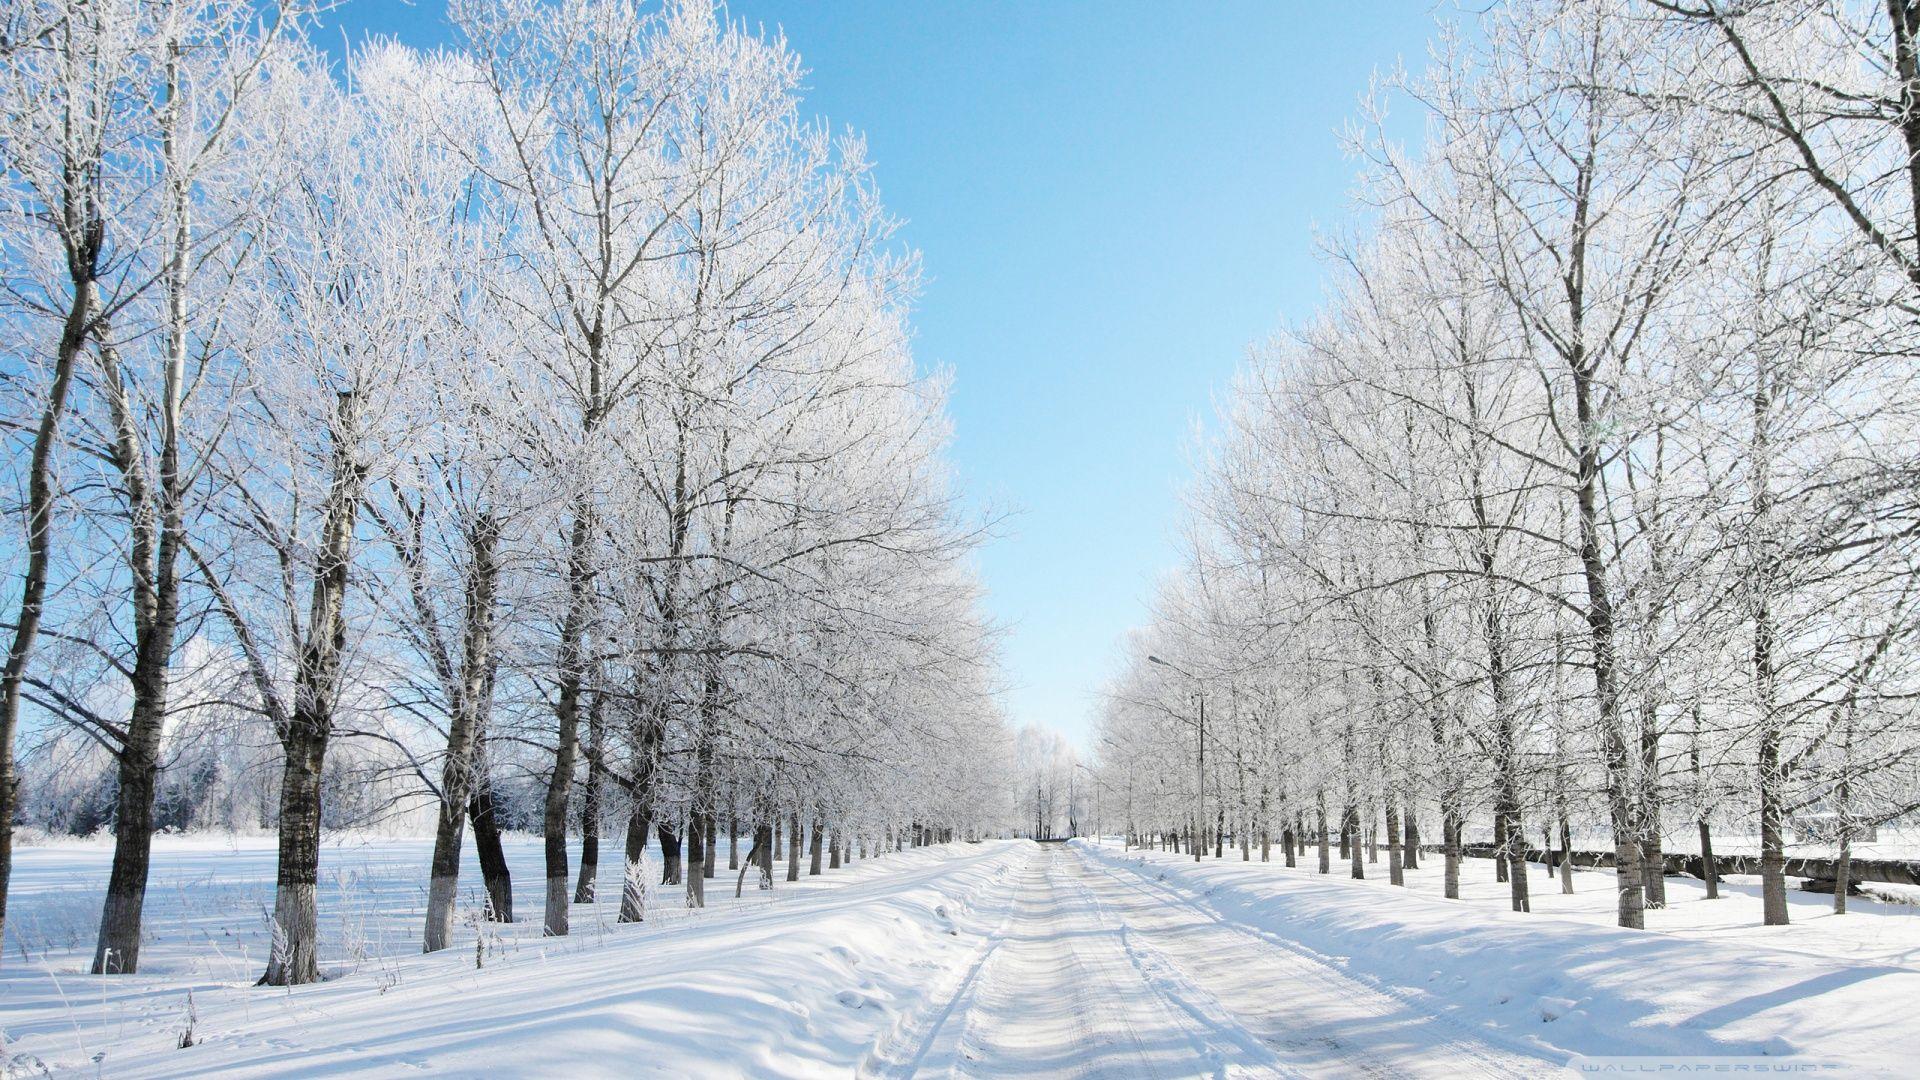 Snow Wallpaper Hd - HD Wallpaper